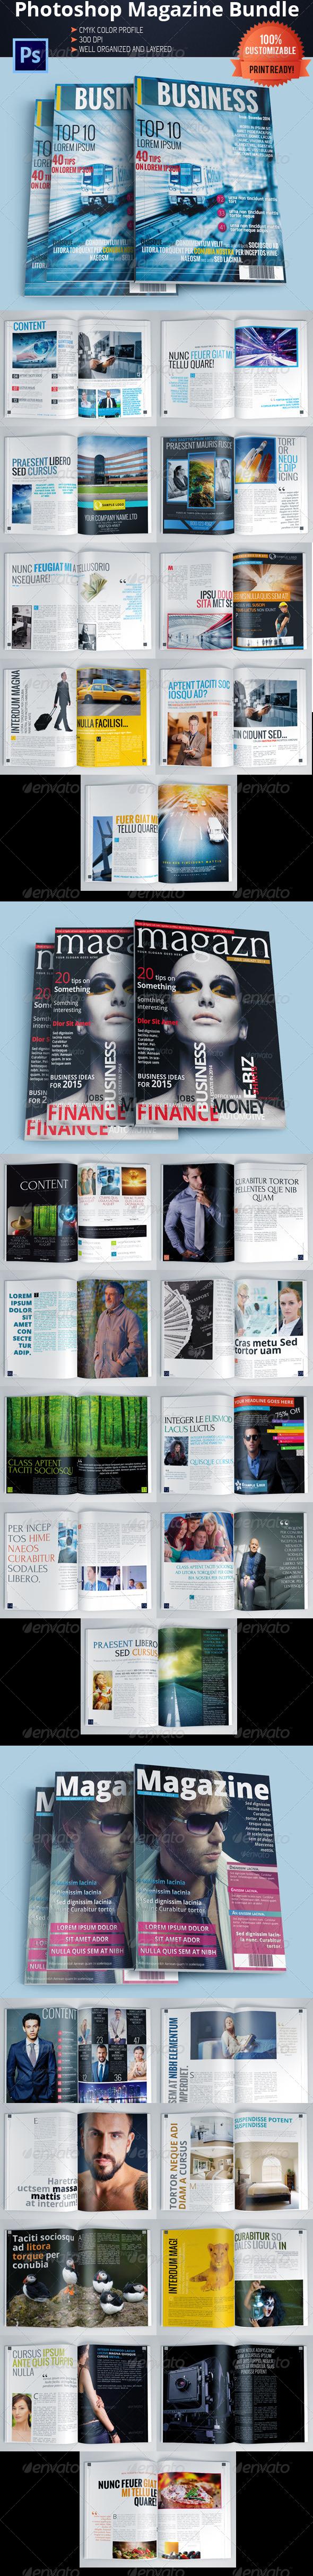 GraphicRiver Magazine Template Bundle Vol.5 5757036